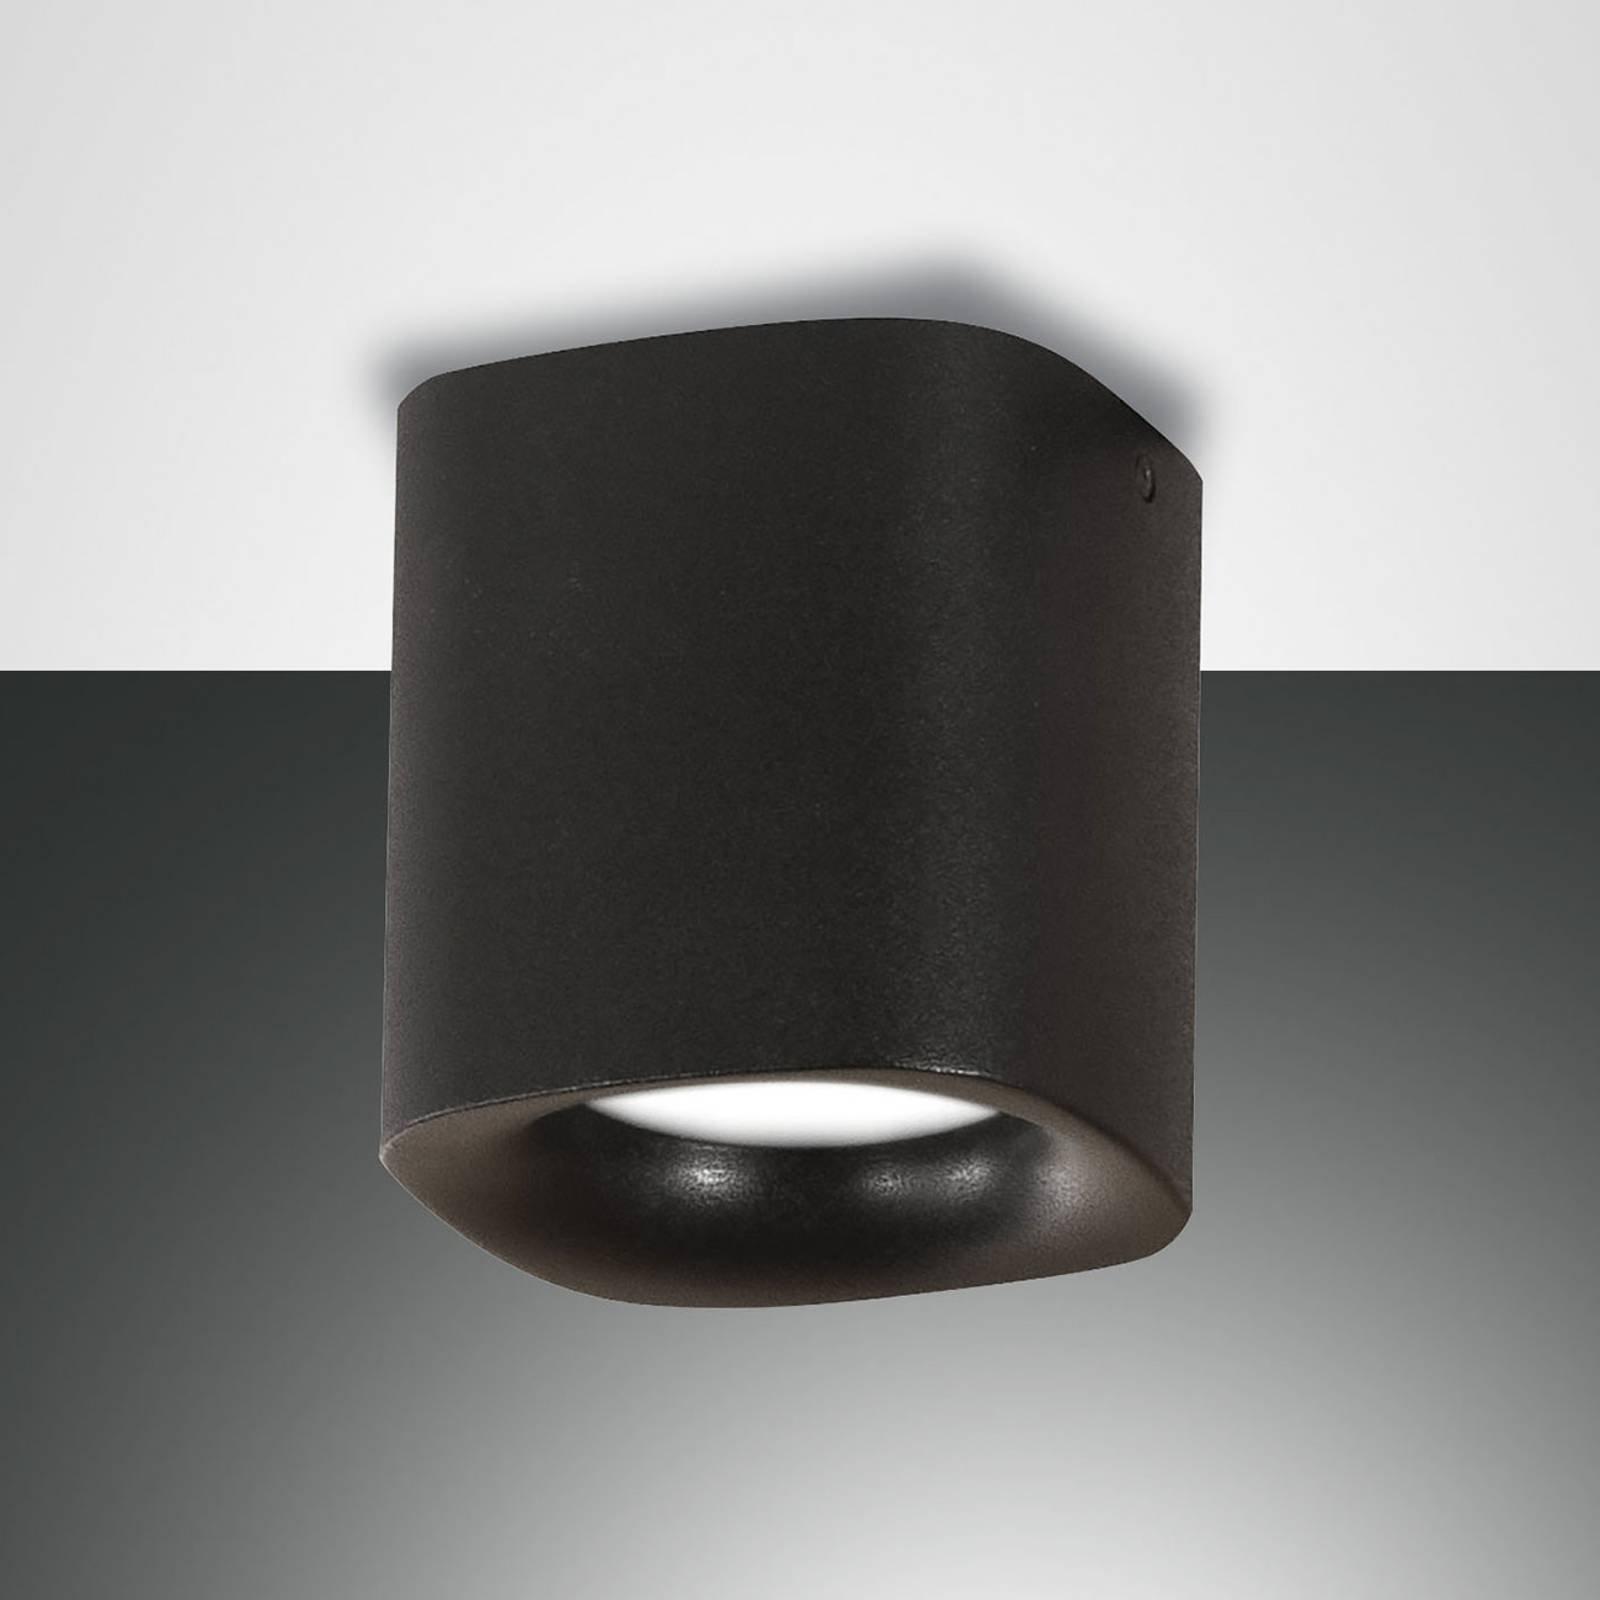 Taklampe Smooth, 1 lyskilde, svart, IP44